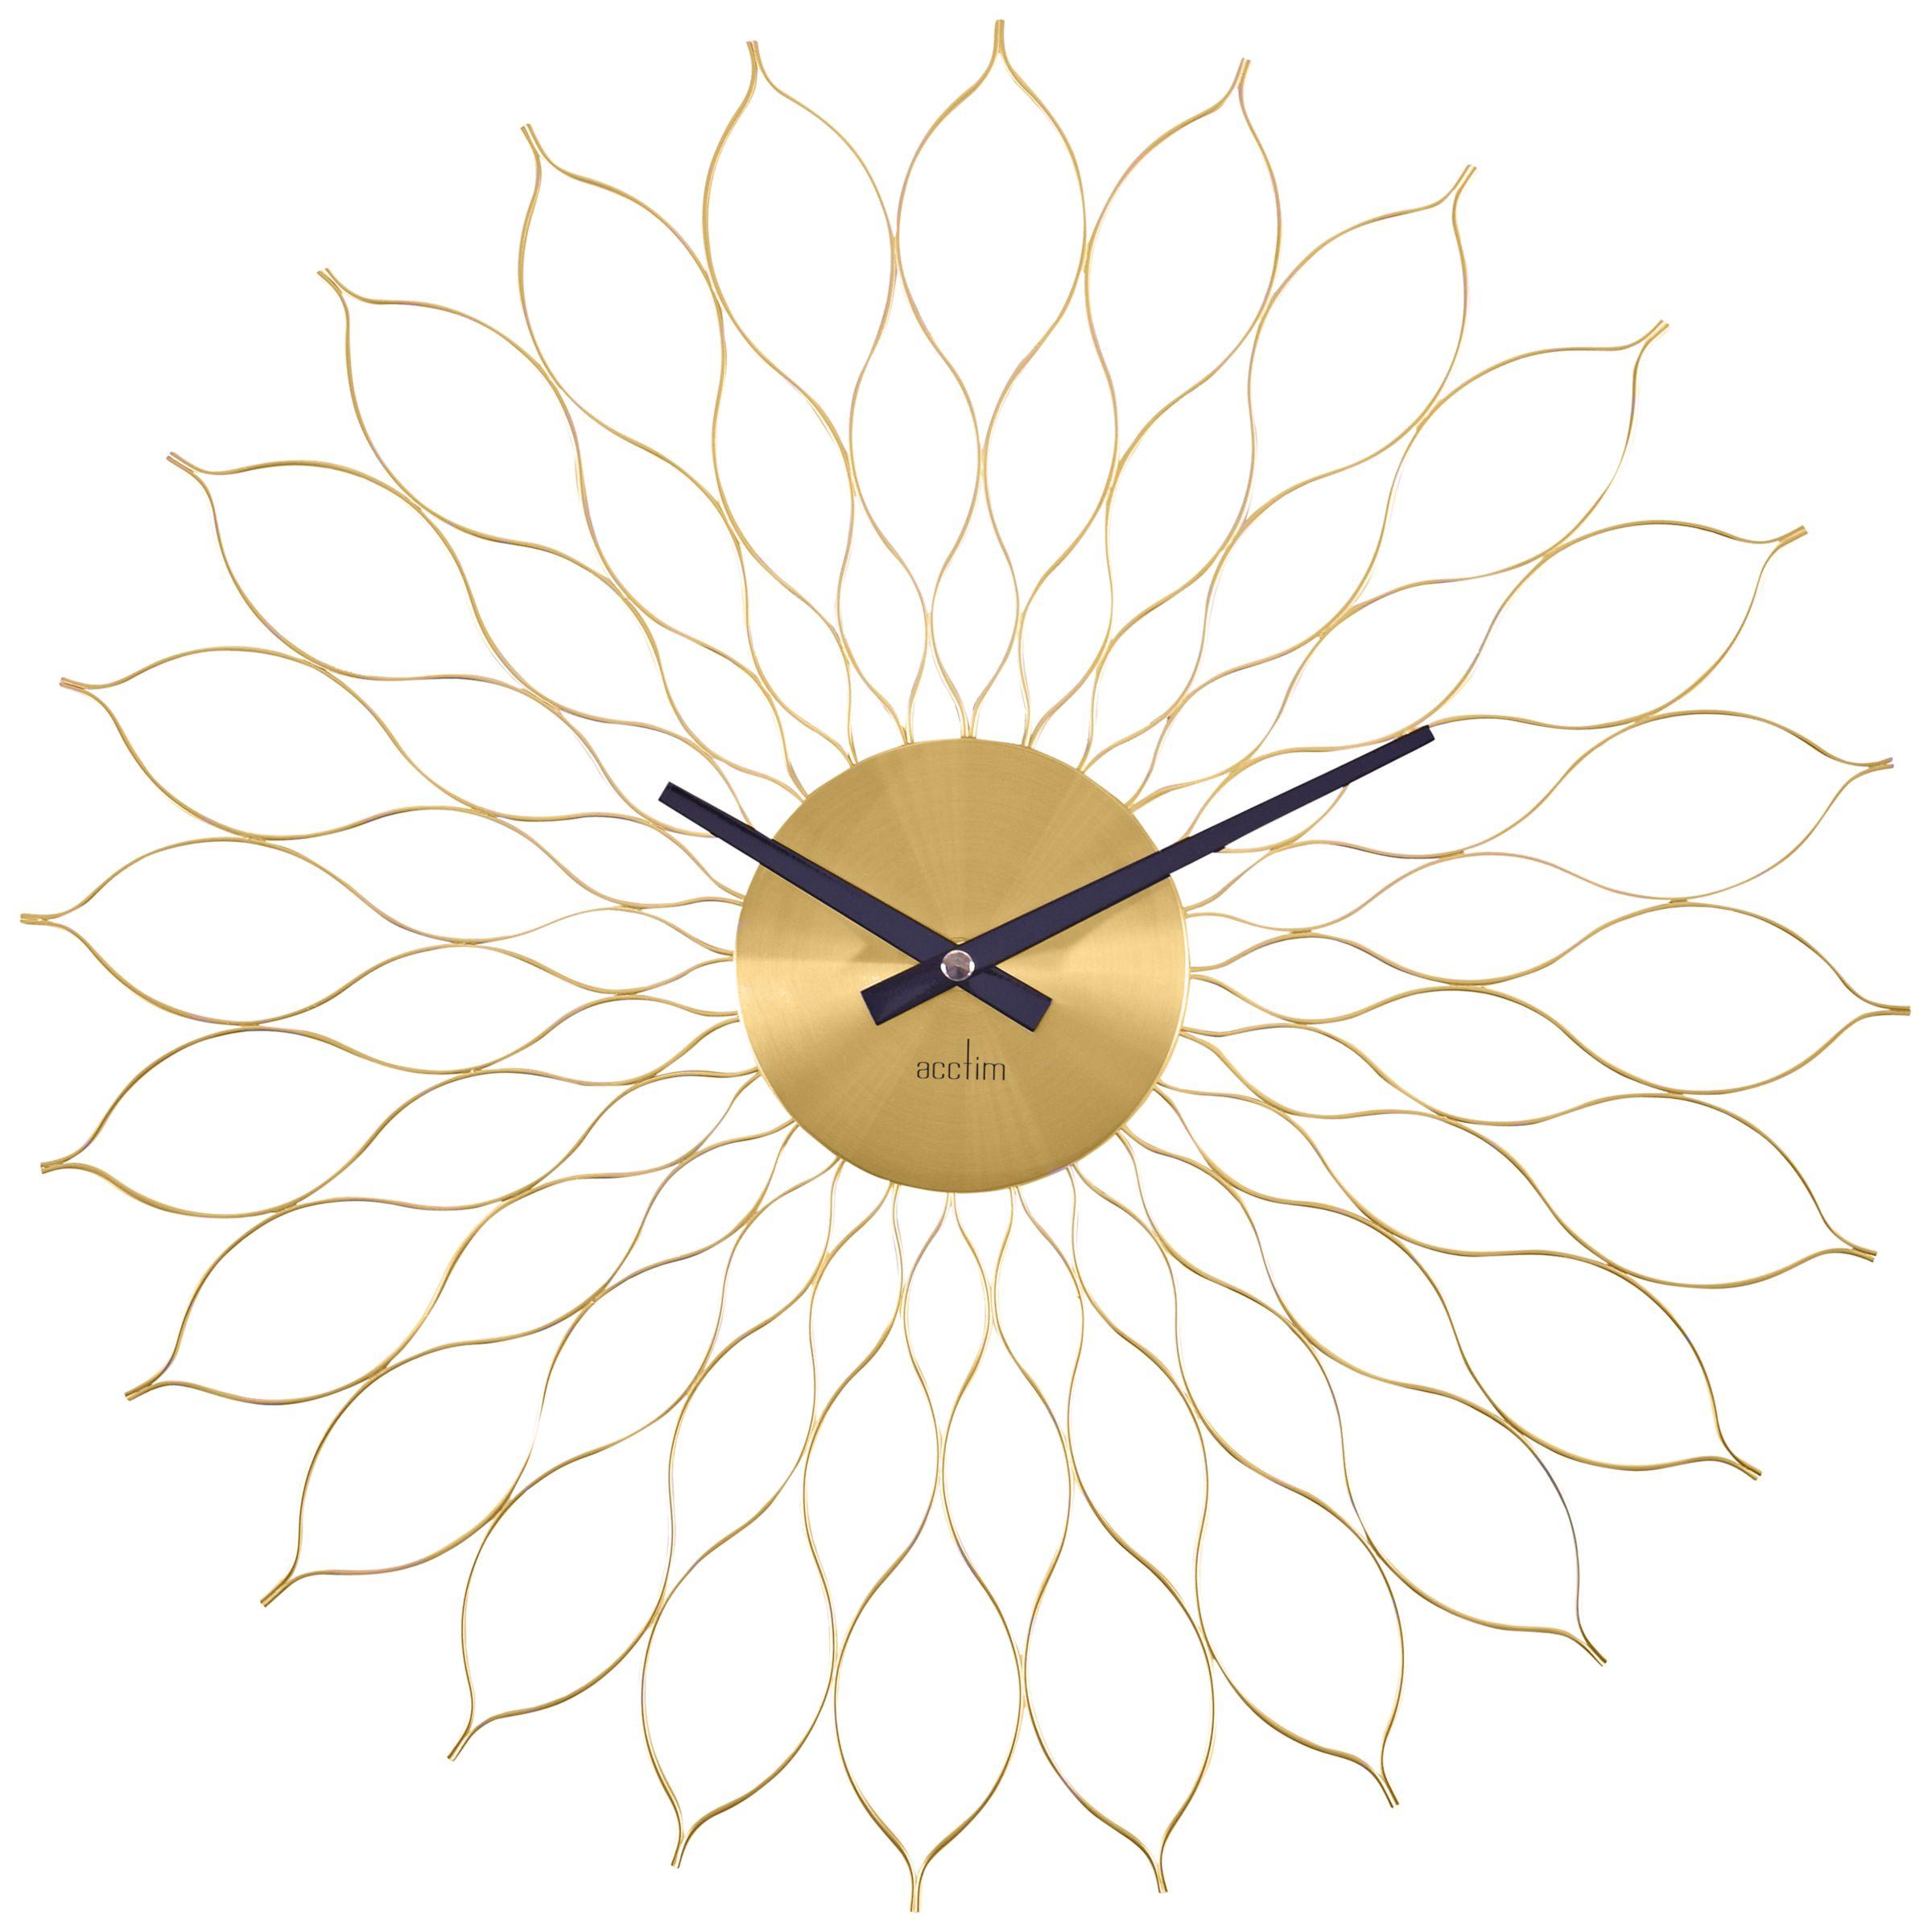 Acctim Acctim Metal Flower Wall Clock, Dia. 49cm, Brass